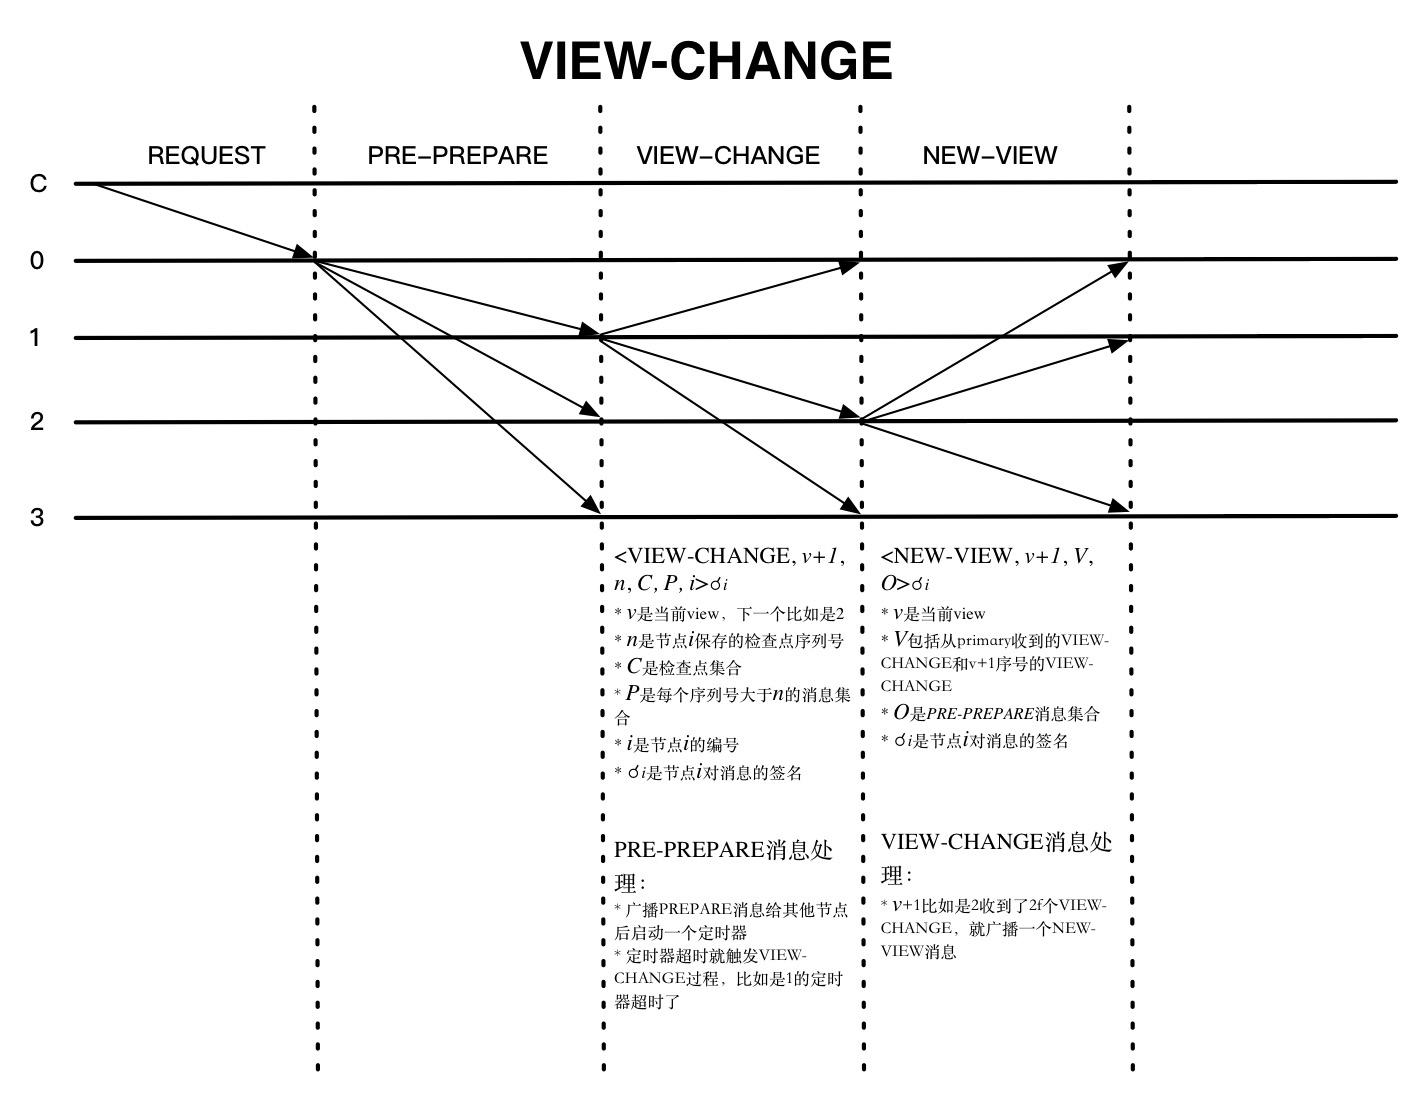 VIEW-CHANGE